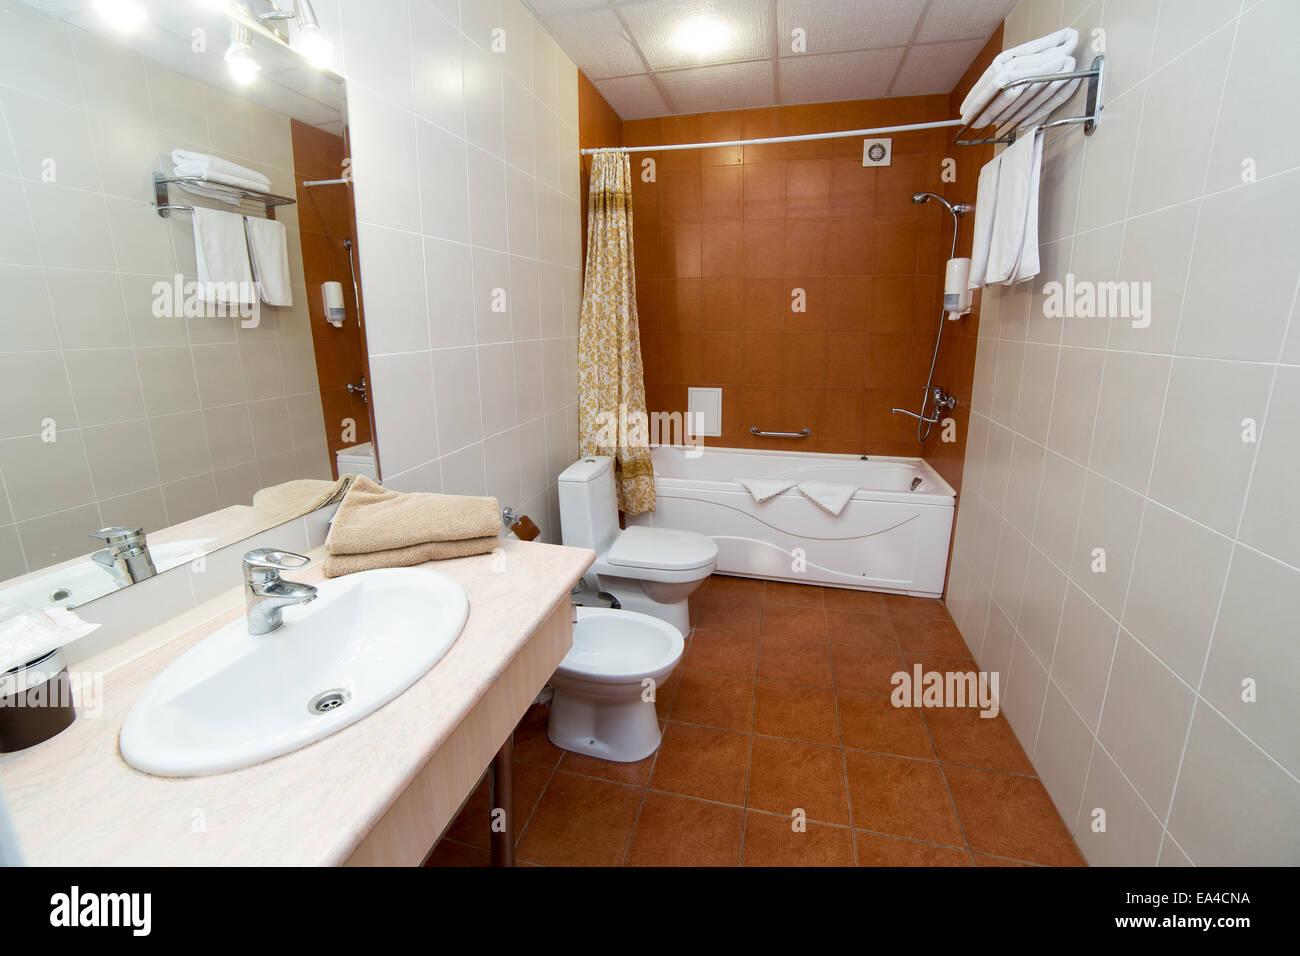 Bathroom, WC, toilet, lavatory room interior design Stock Photo ...